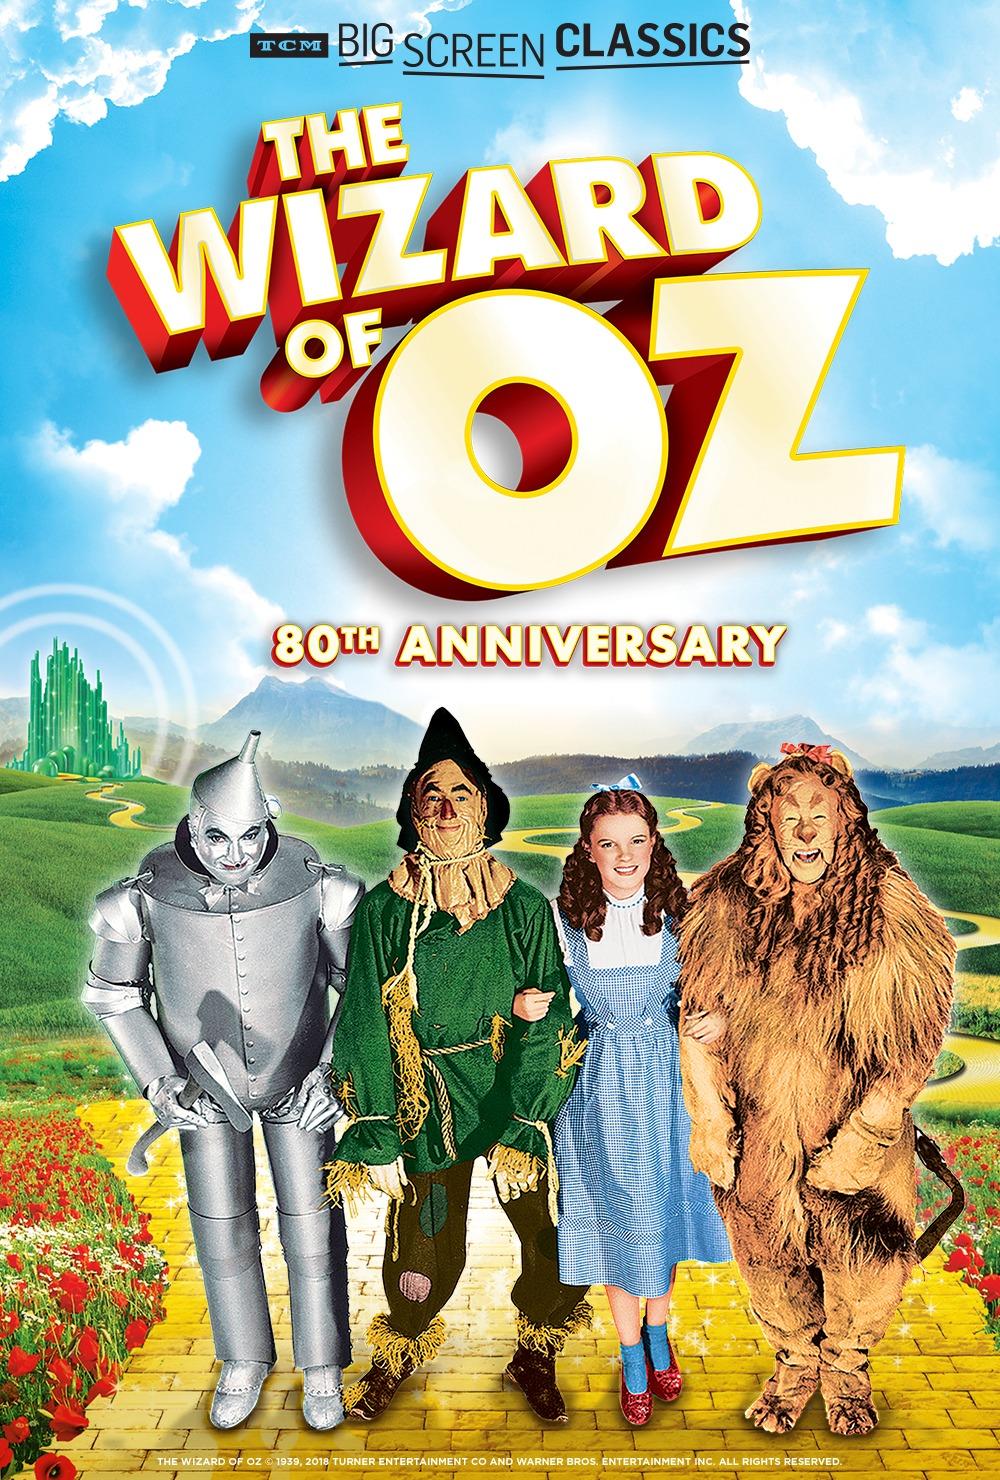 wizard-of-oz-poster-89ece605221295053e6bcbfd60dfdf09.jpg